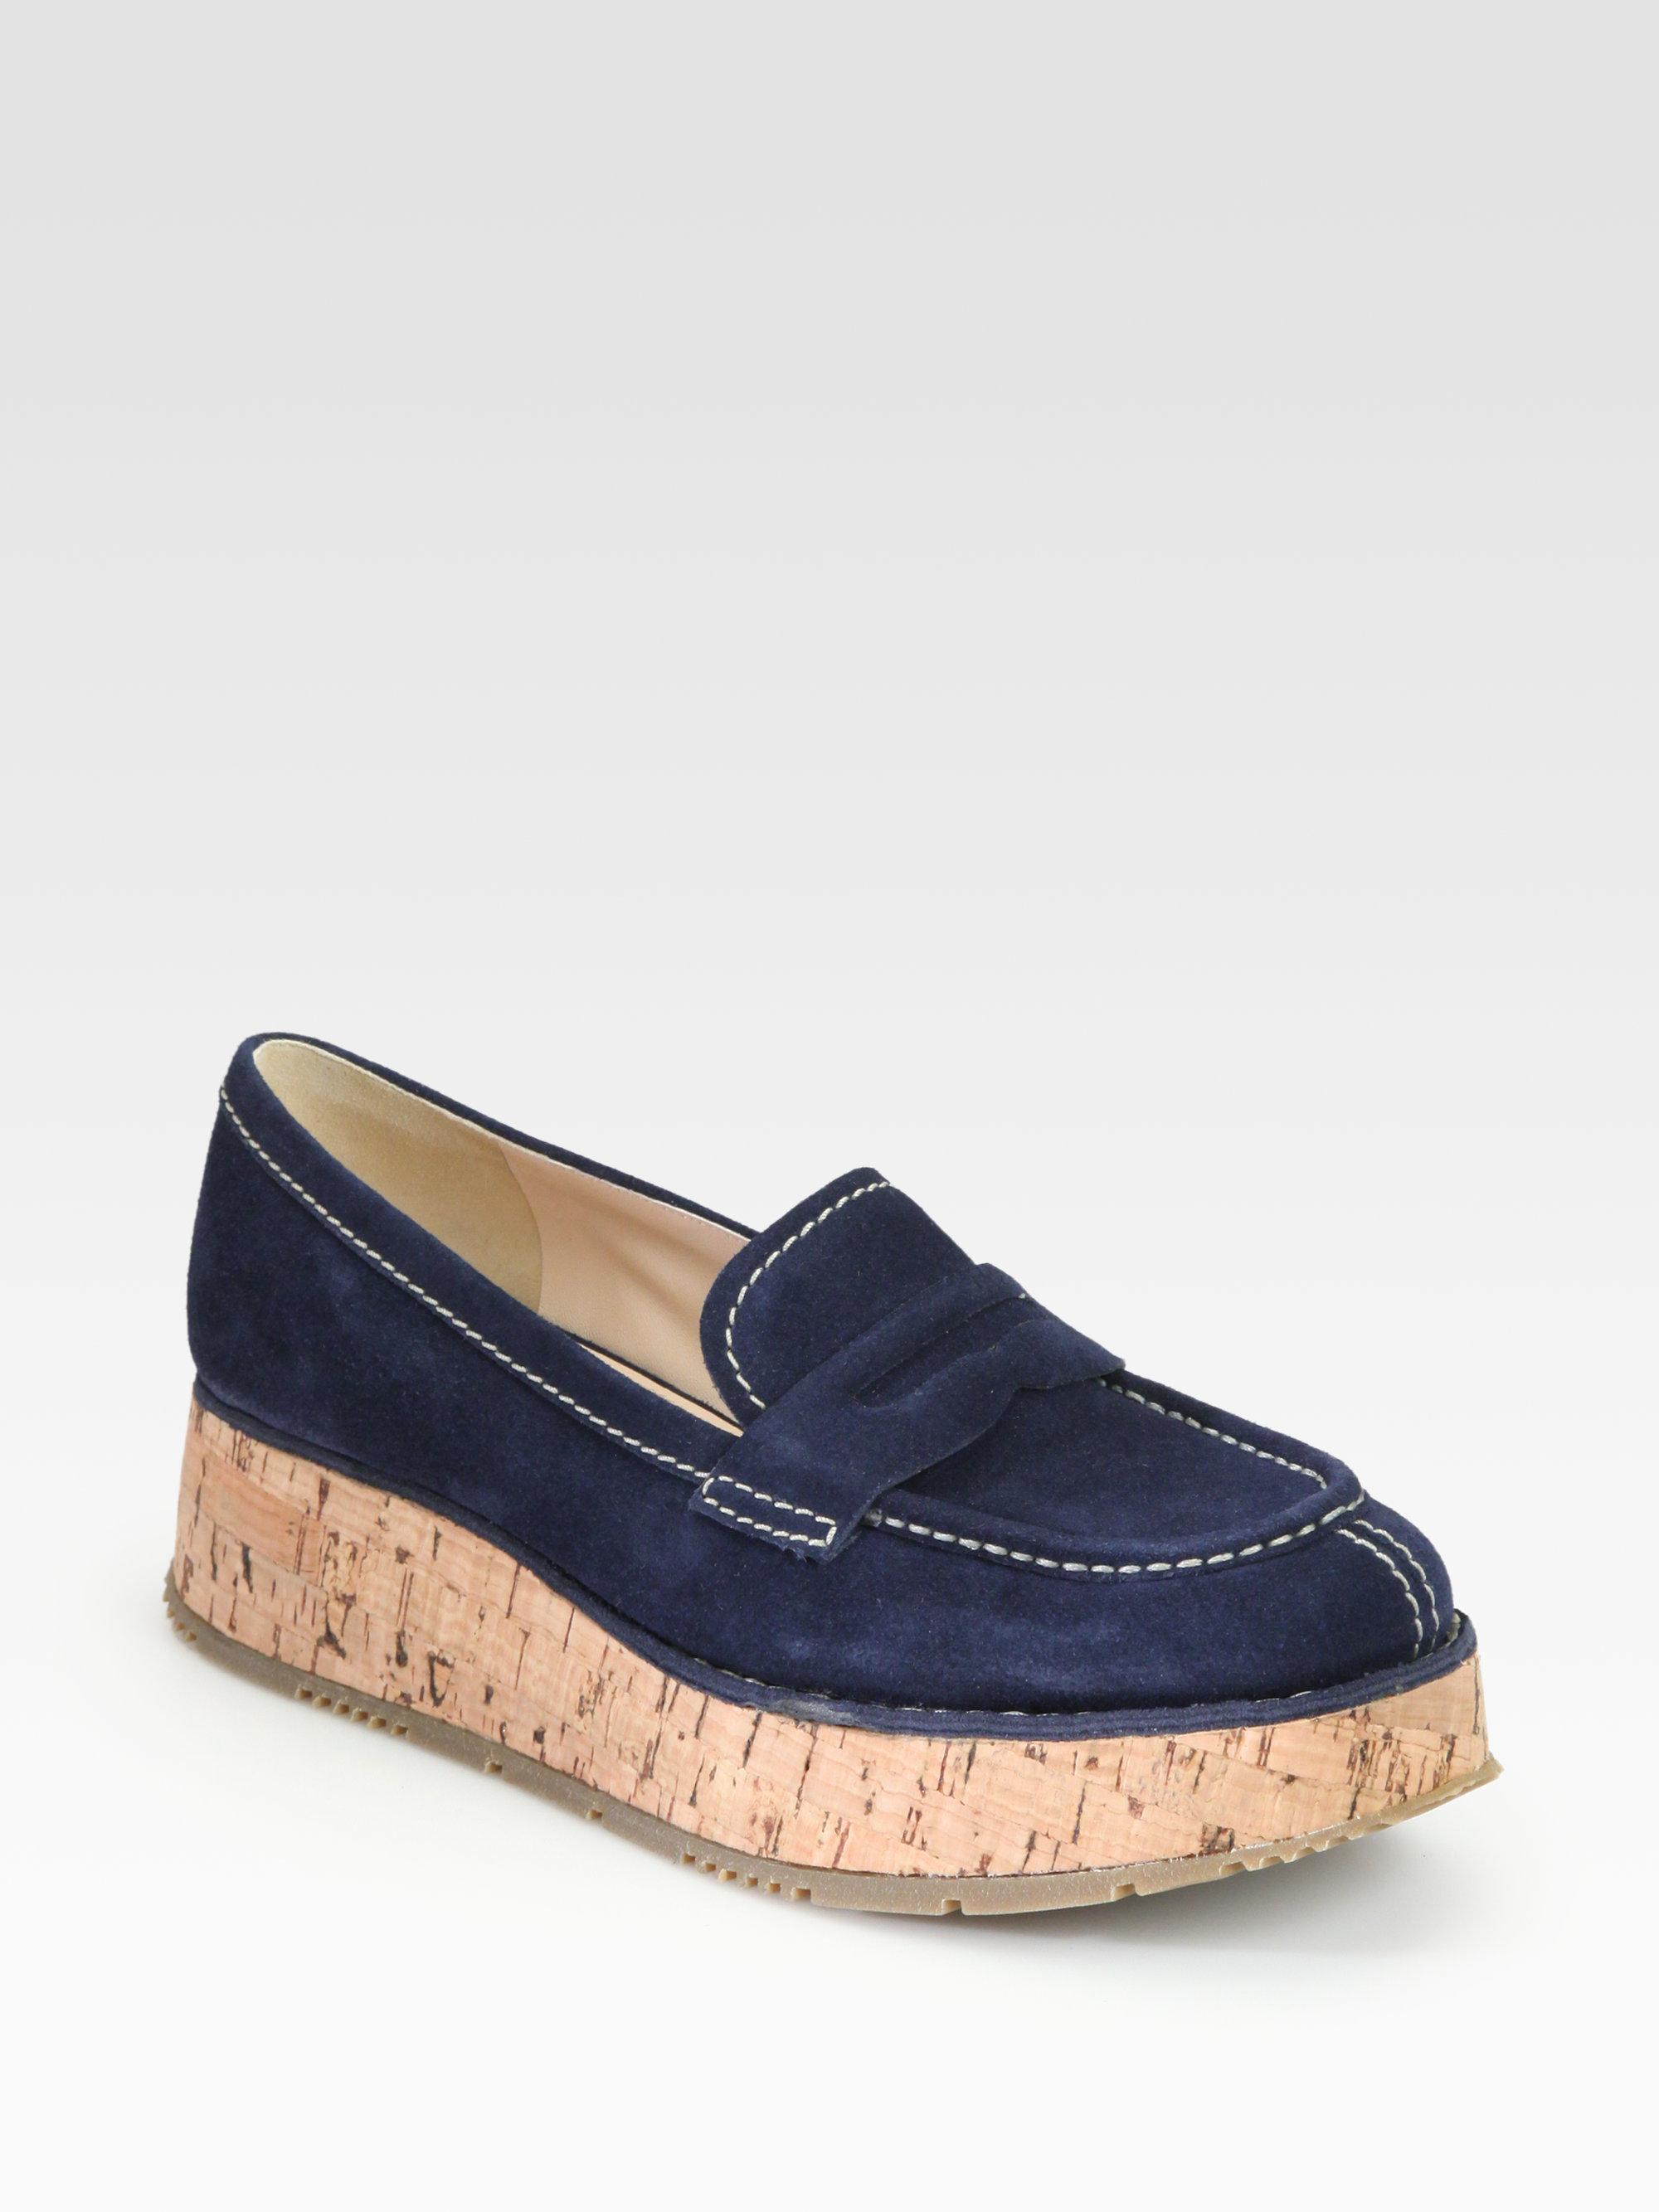 25d49e4324f promo code for prada leather platform loafers 4f04f 4adbc  shopping lyst  prada suede cork platform loafers in blue 91f89 e3728